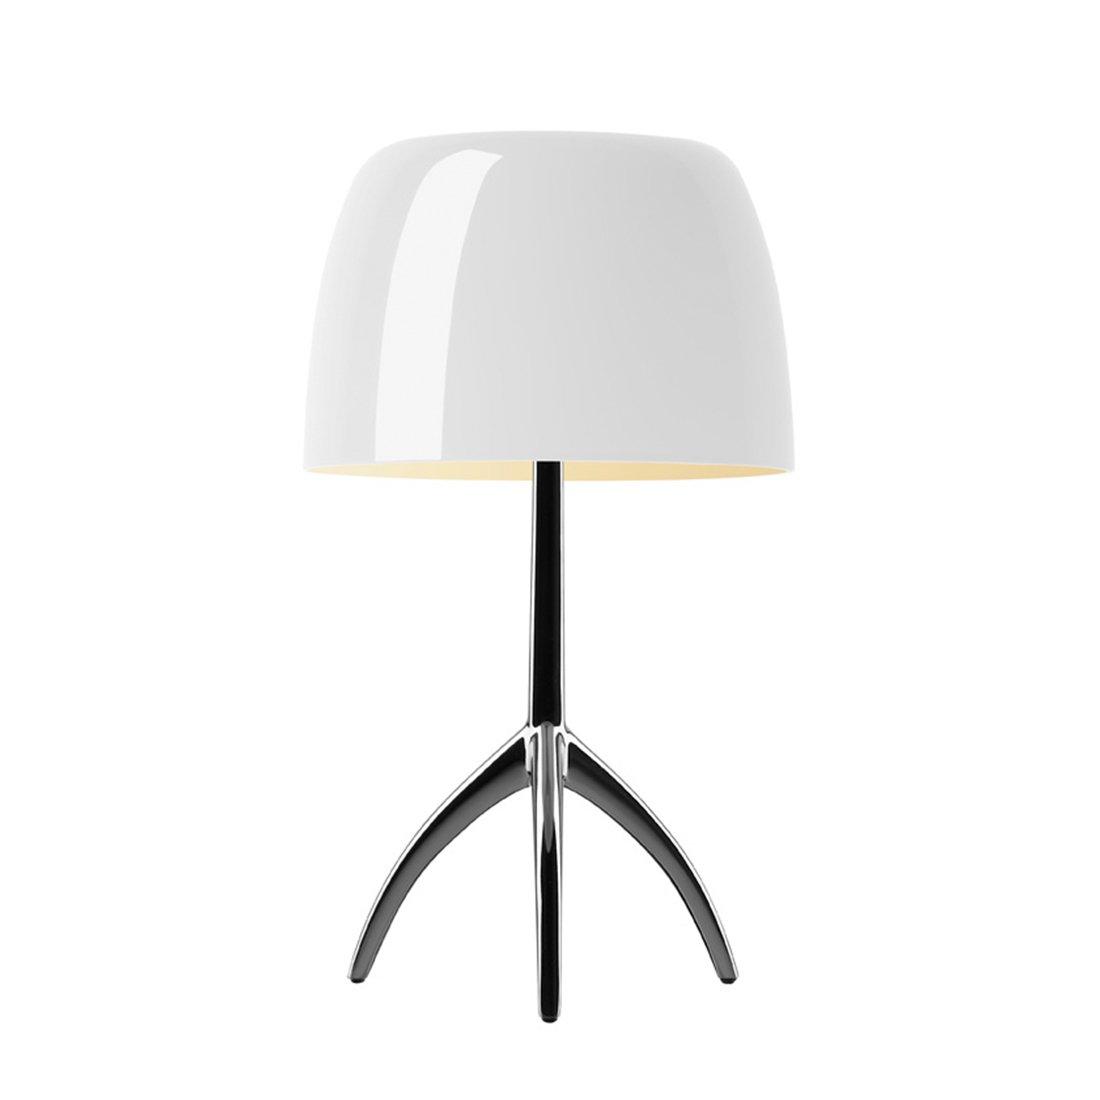 Foscarini Lumiere Piccola Tafellamp Dimbaar - Warm Wit - Zwart Chroom